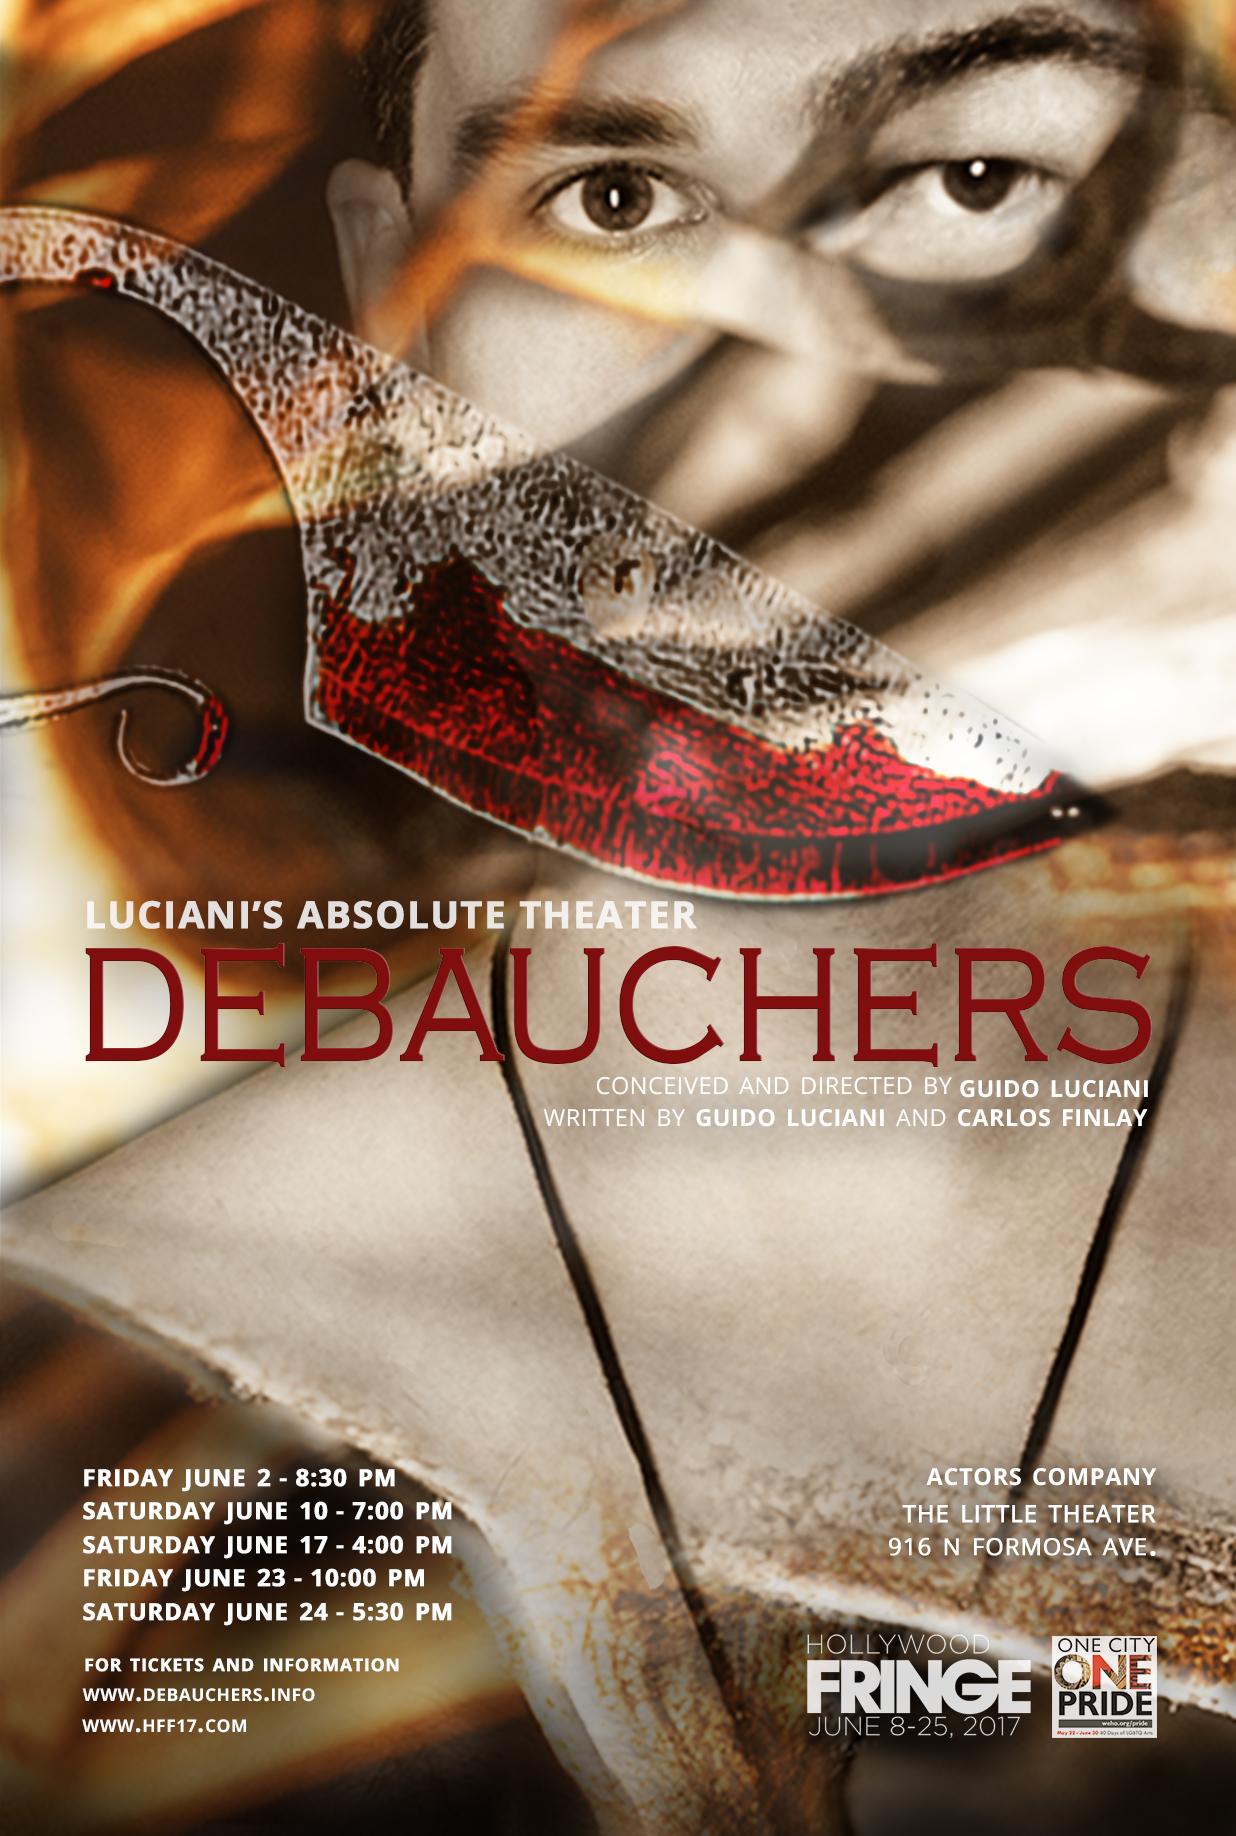 DEBAUCHERS_POSTCARD_MASTER_BLEED_V.2.jpg